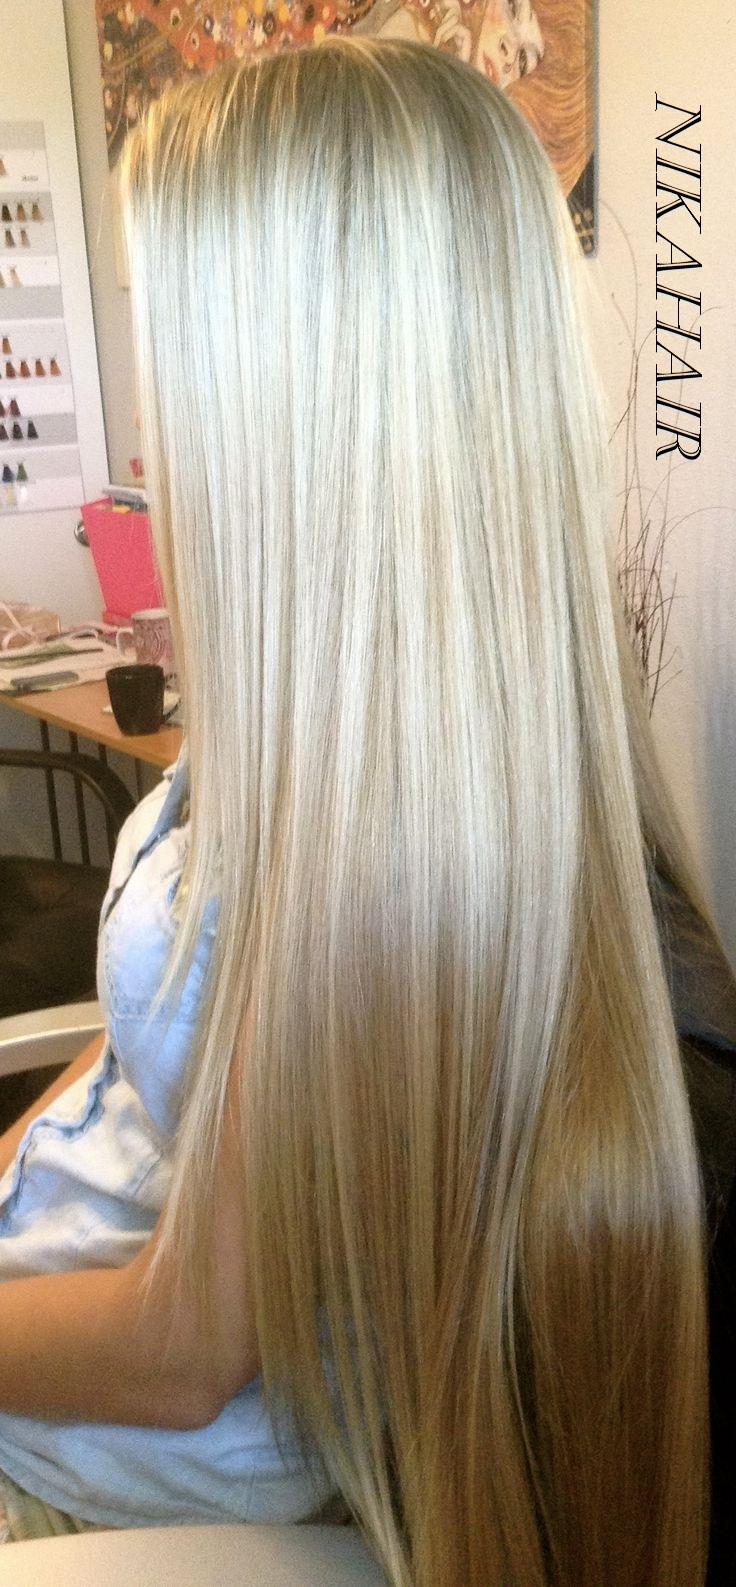 Clip in vlasy - 60cm dlhý pás vlasov - odtieň F 18 613 empty 6abce3ec7d8